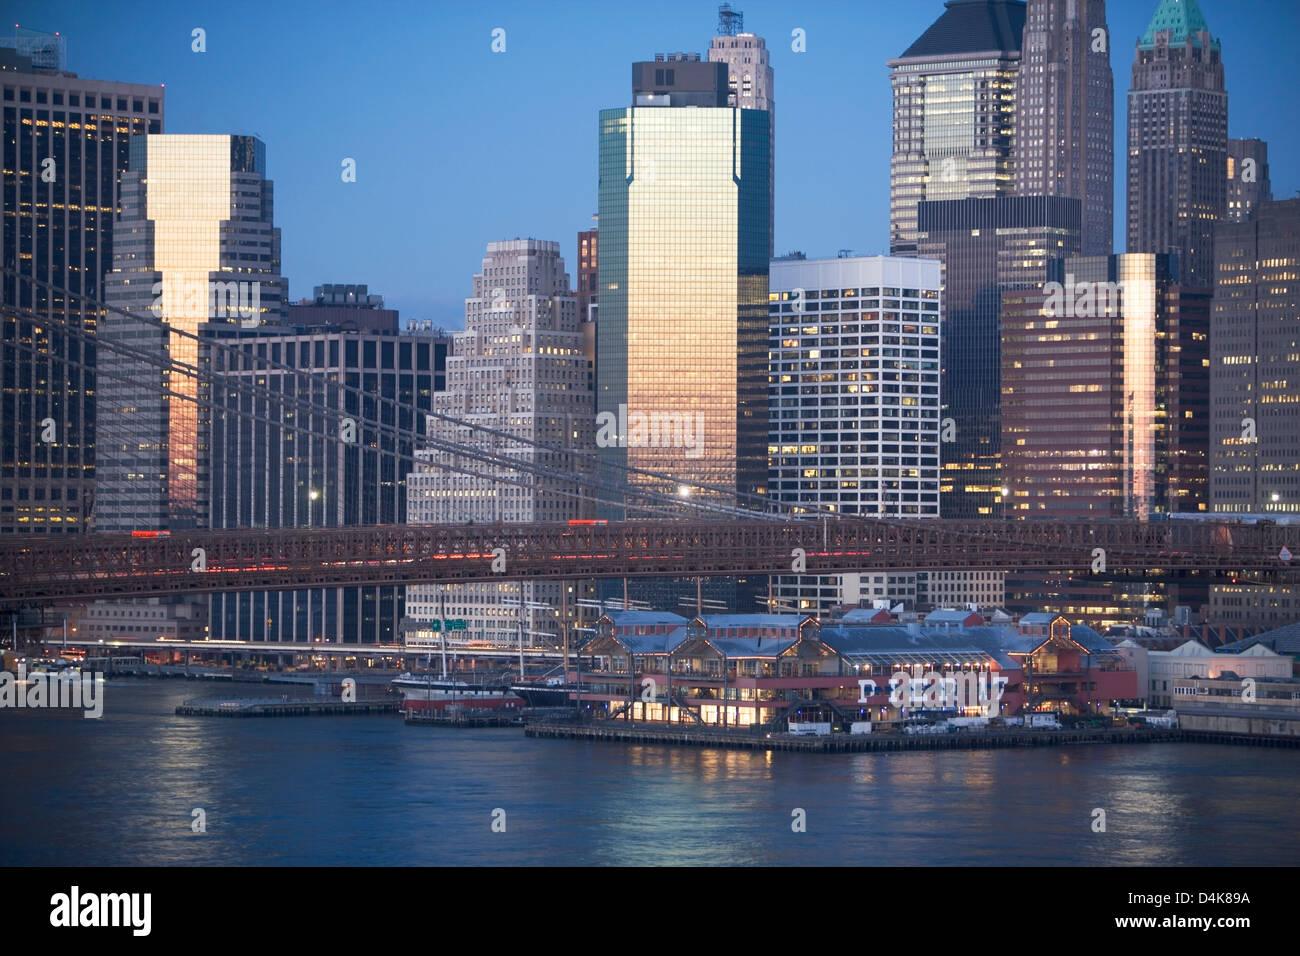 New York City lit up at night - Stock Image